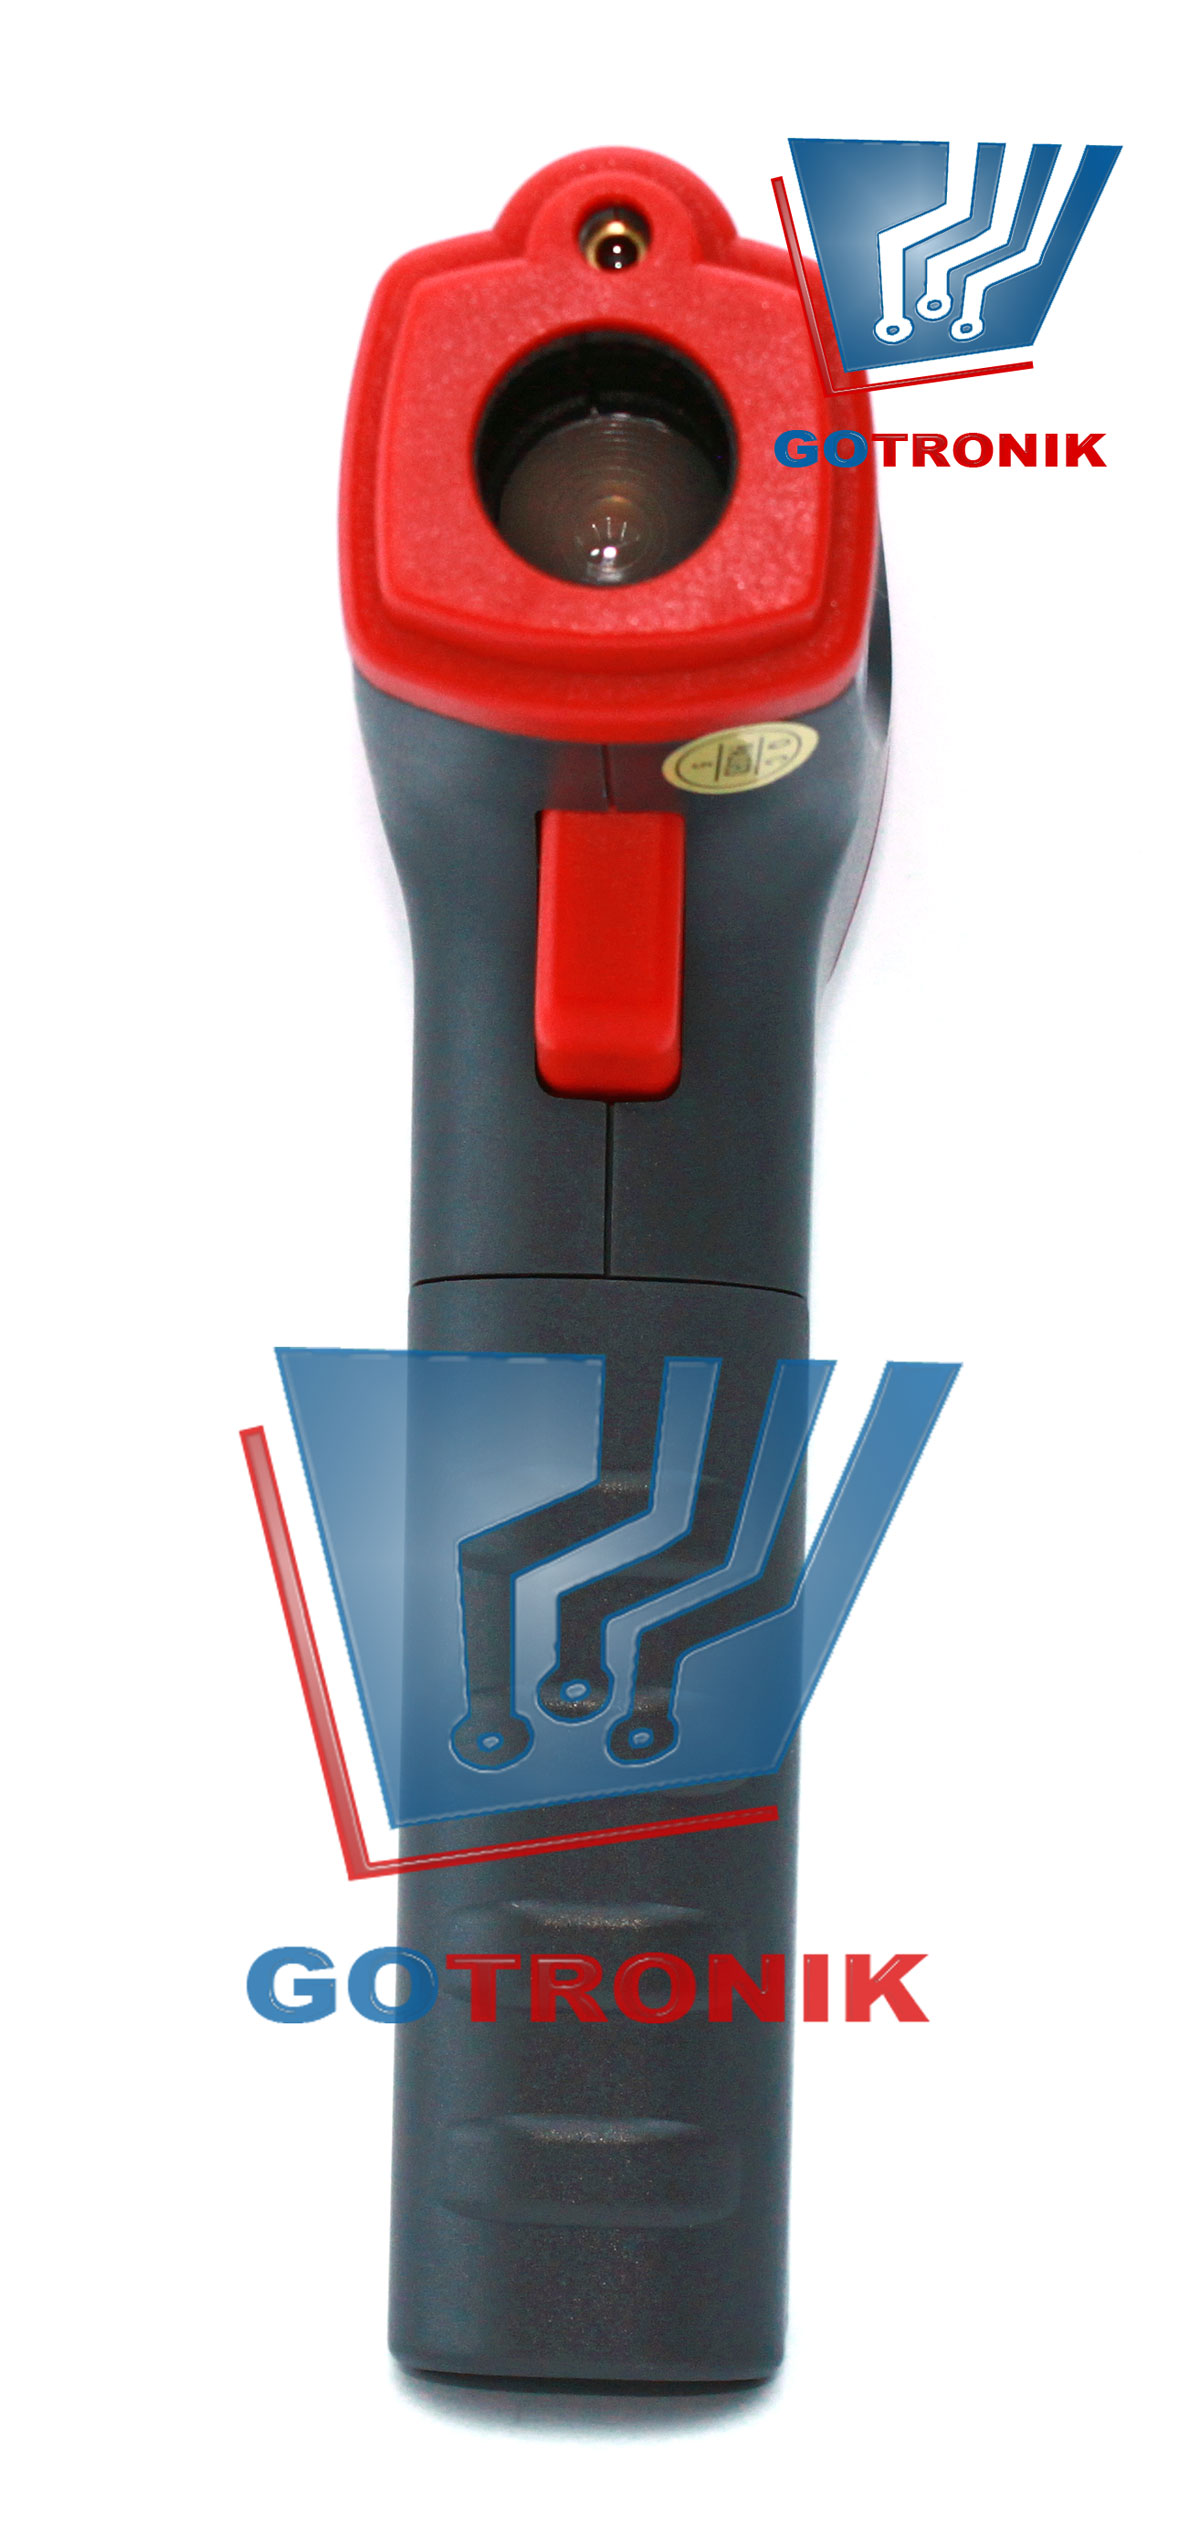 Pirometr UT300B laserowy miernik temeratury UT-300B produkcji Uni-trend